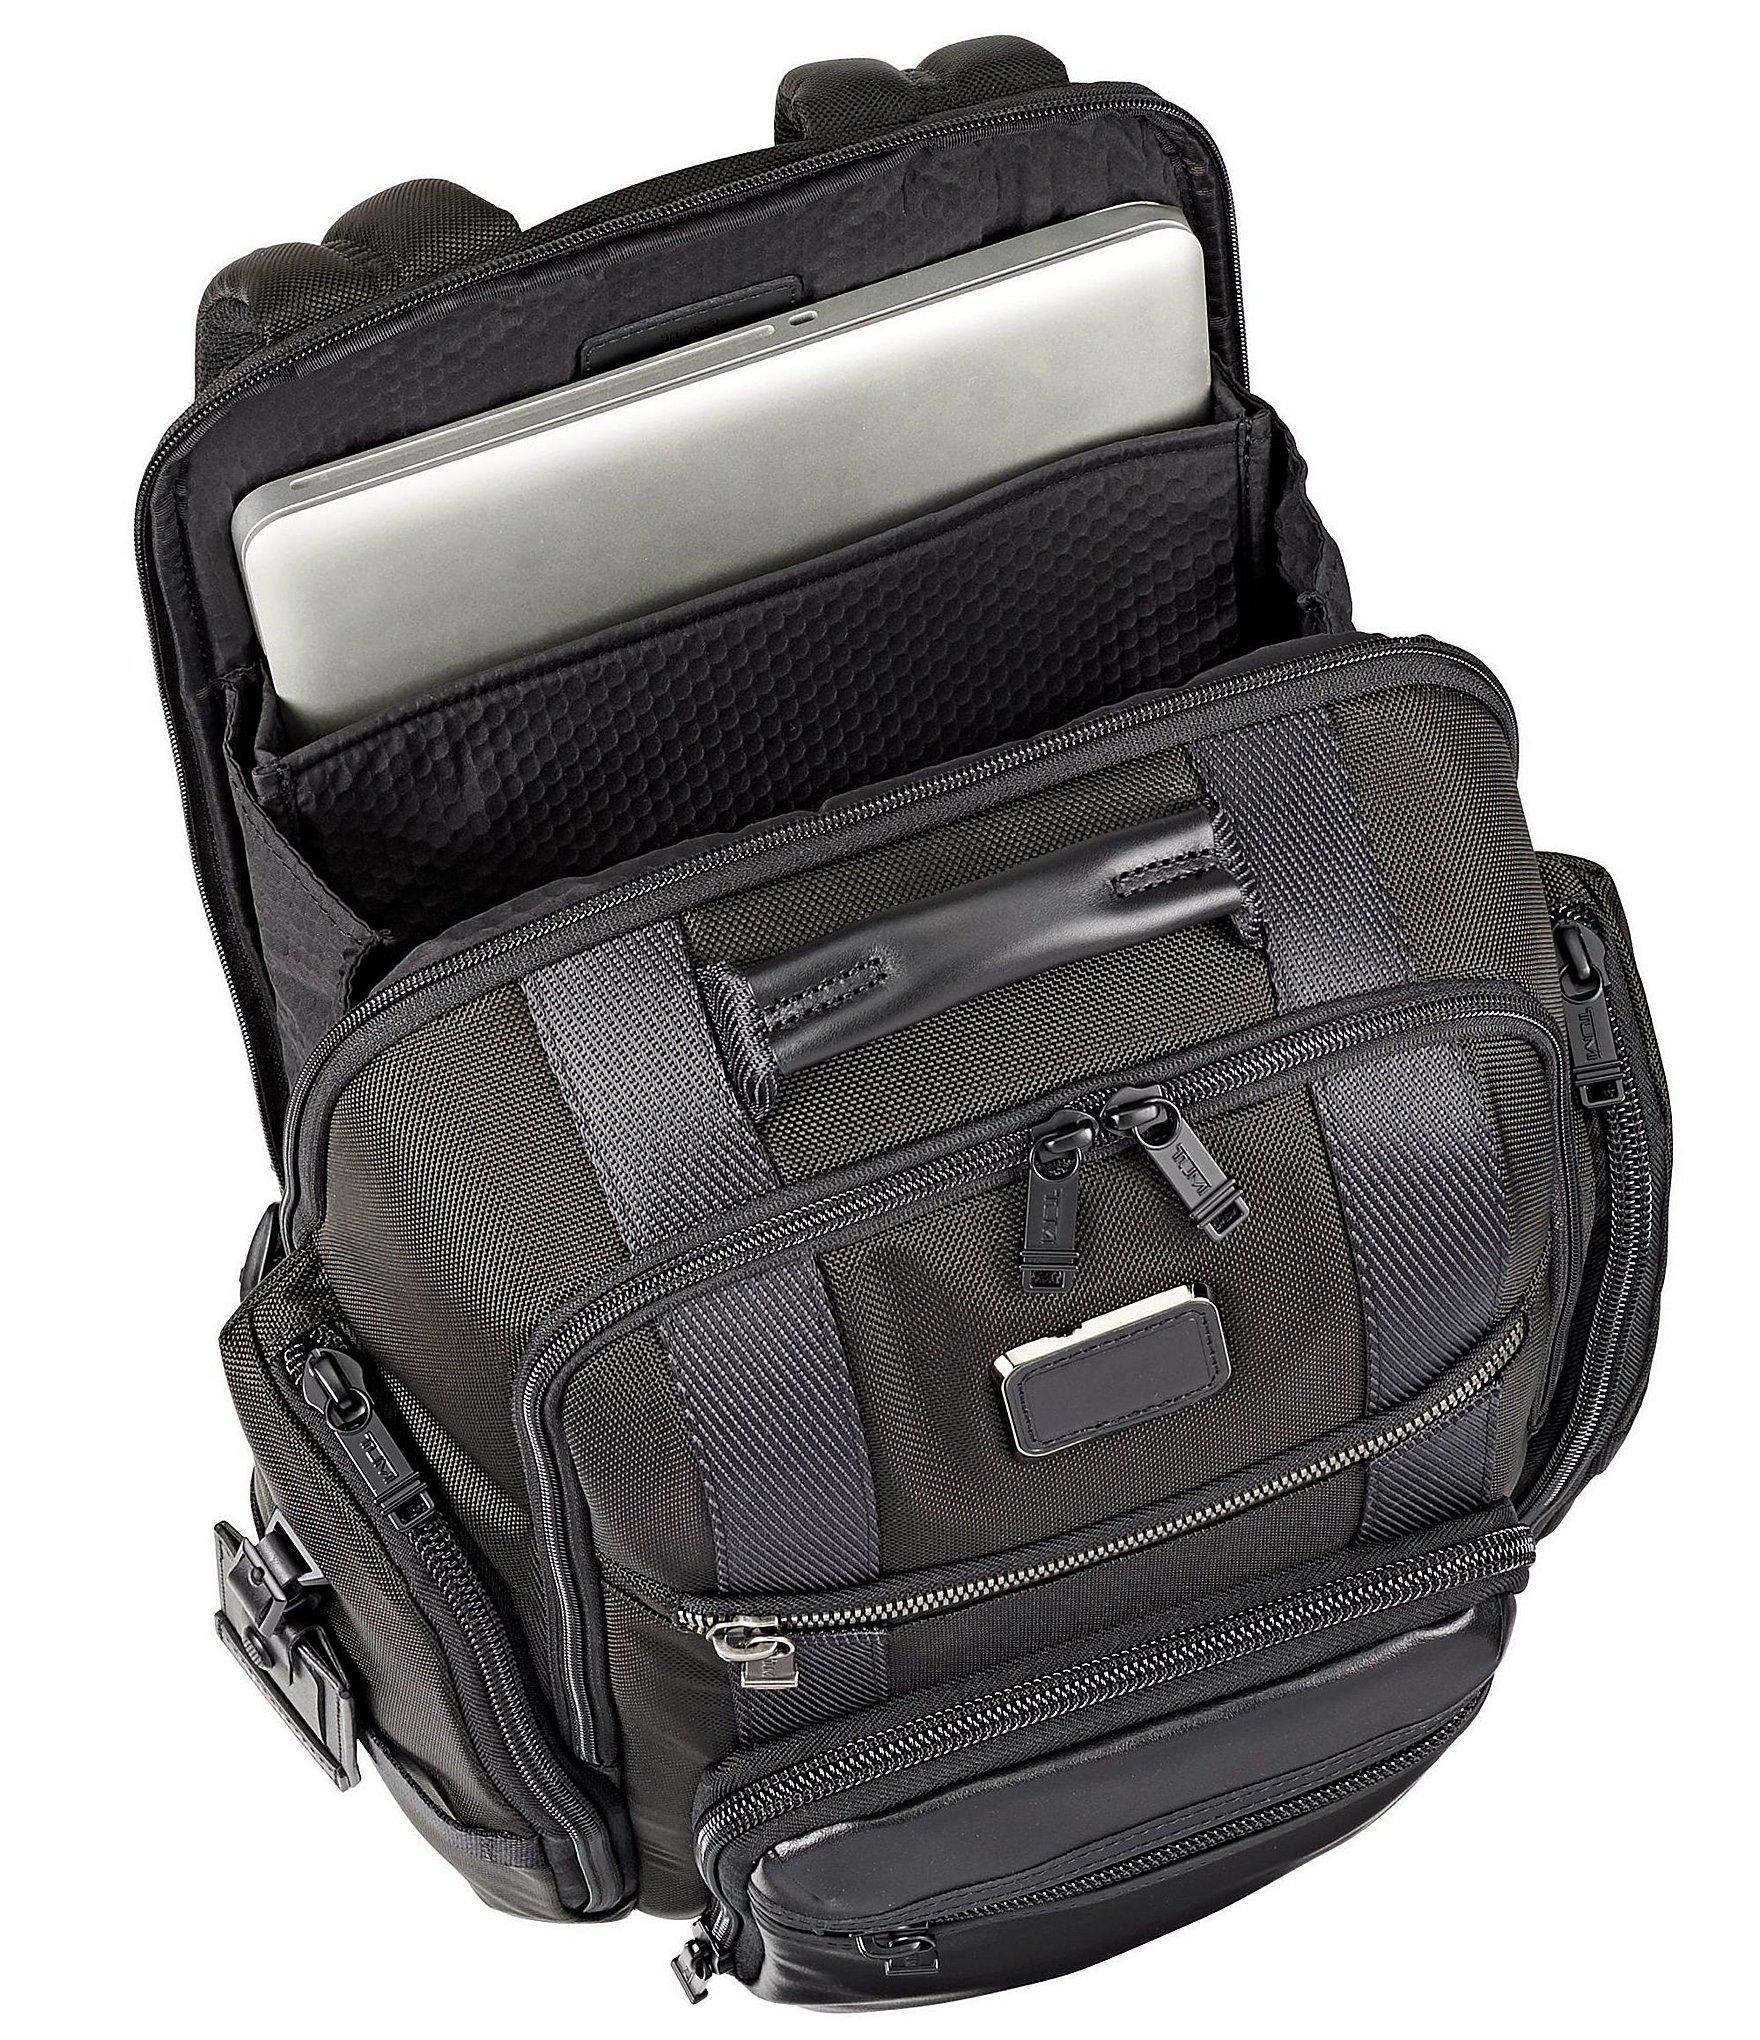 7b4047e8e Tumi - Black Alpha Bravo Sheppard Deluxe Brief Backpack for Men - Lyst.  View fullscreen